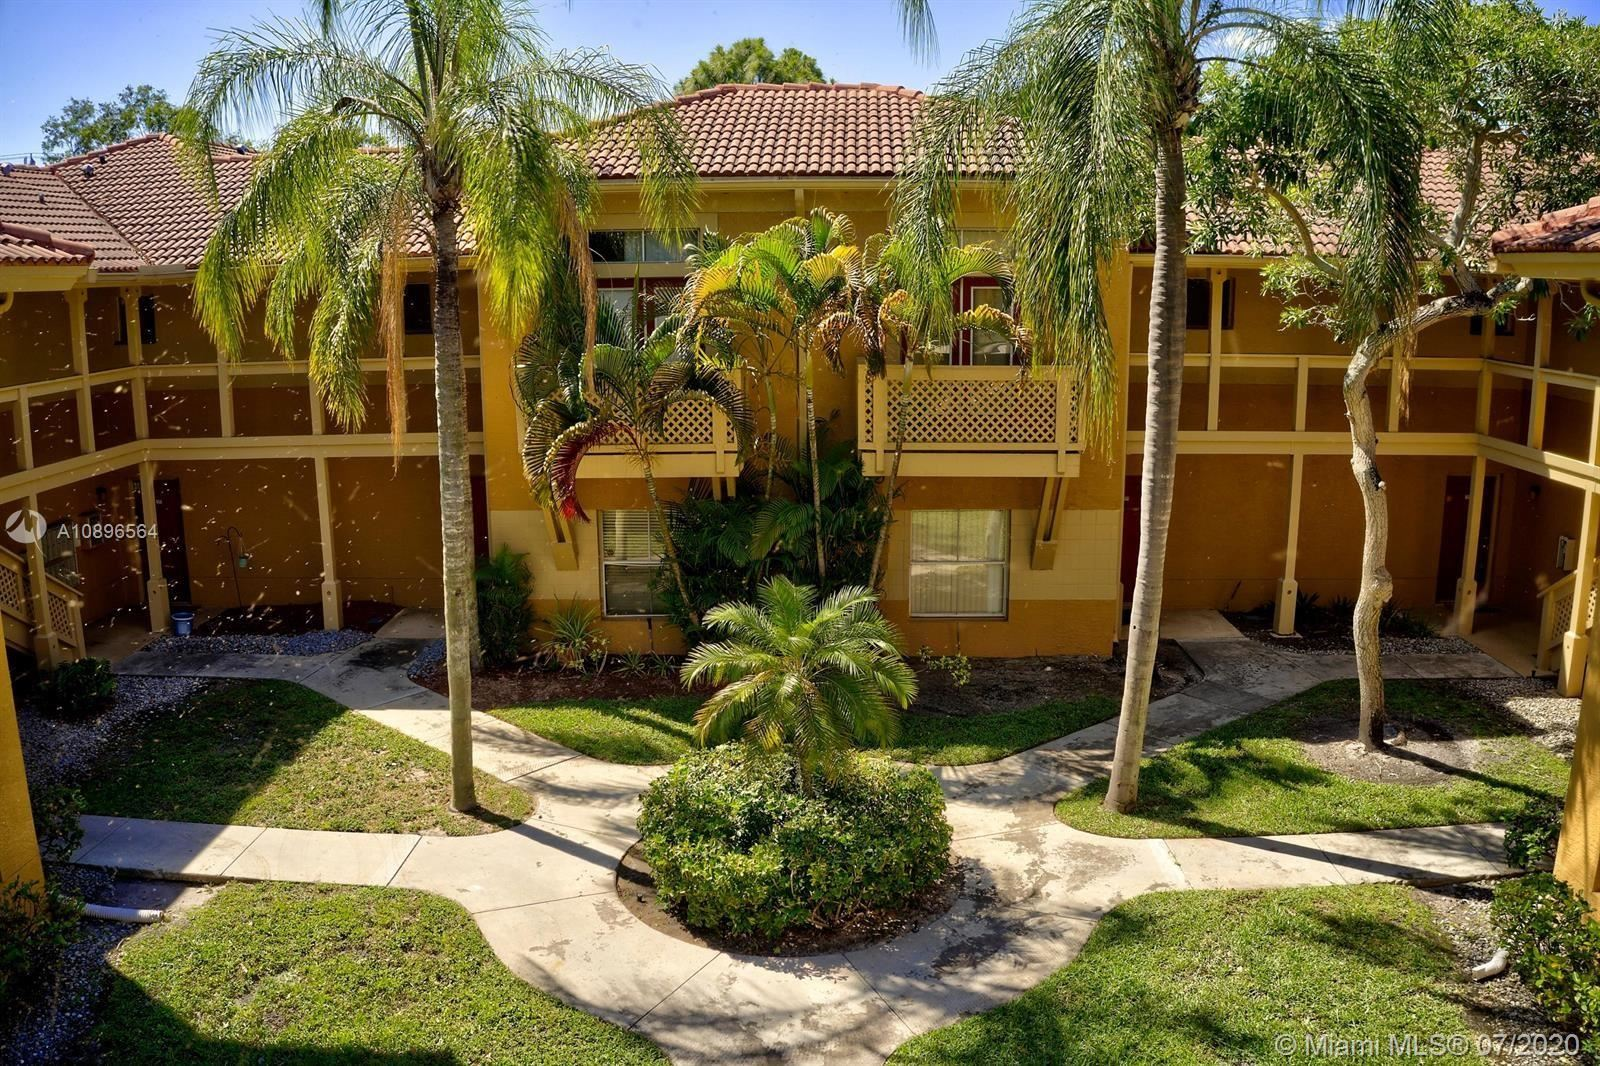 4871 Via Palm Lks #705, West Palm Beach, FL 33417 - #: A10896564